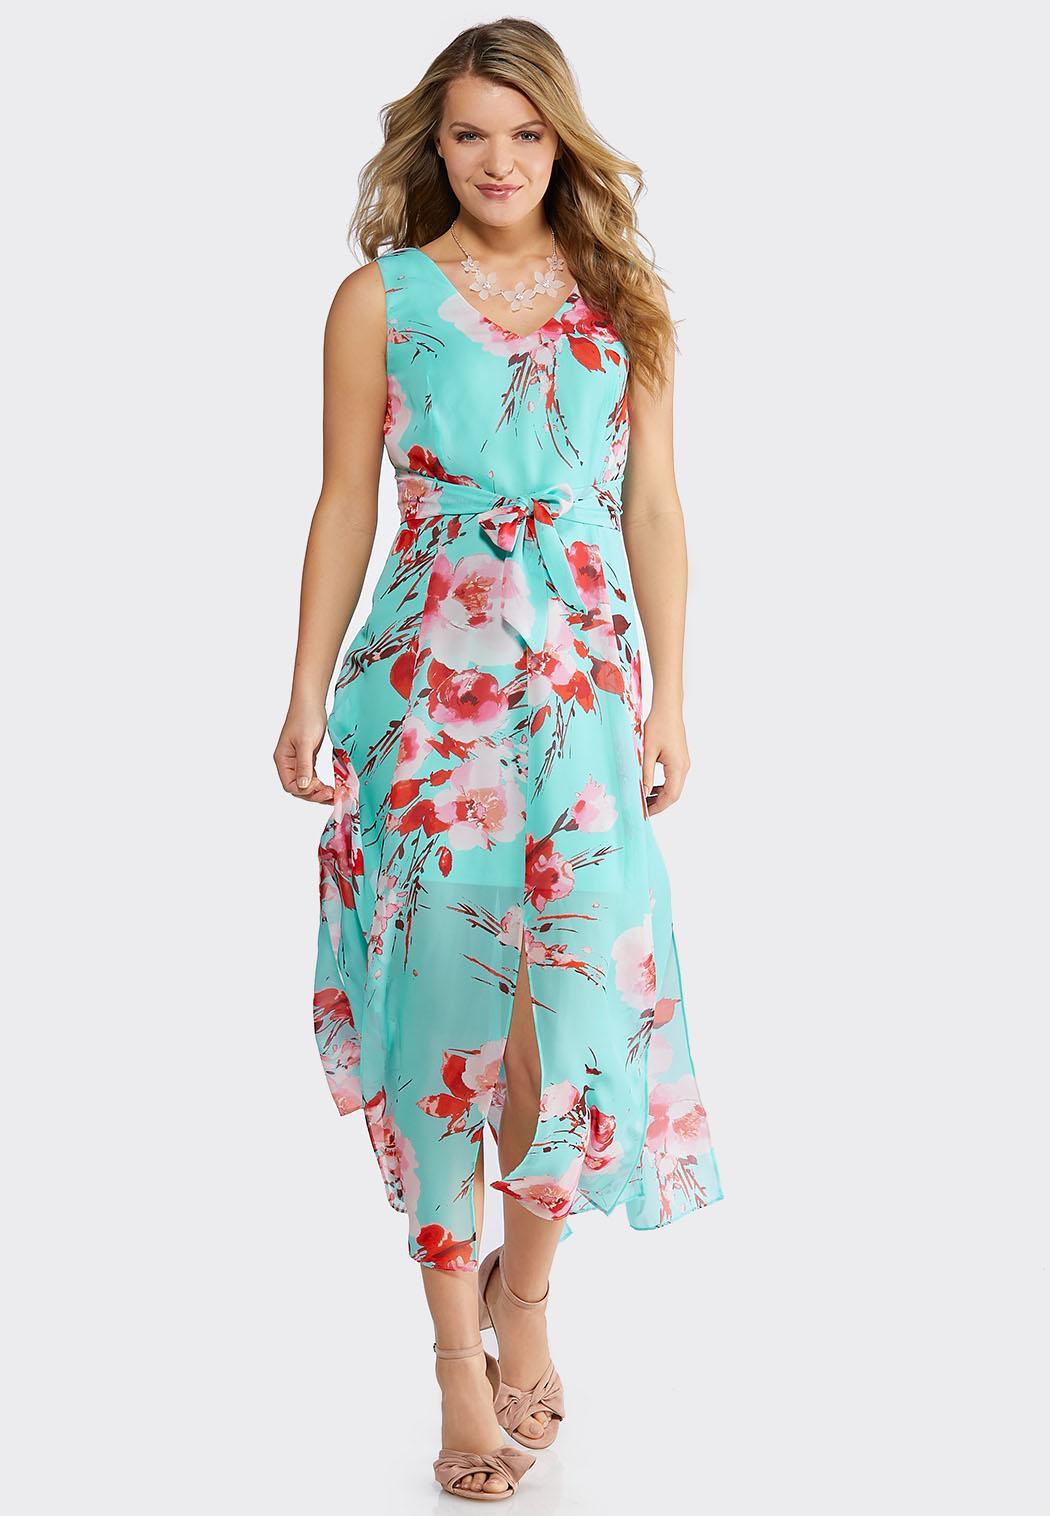 1fef9e7dcbc Plus Size Turquoise Floral Maxi Dress Maxi Cato Fashions